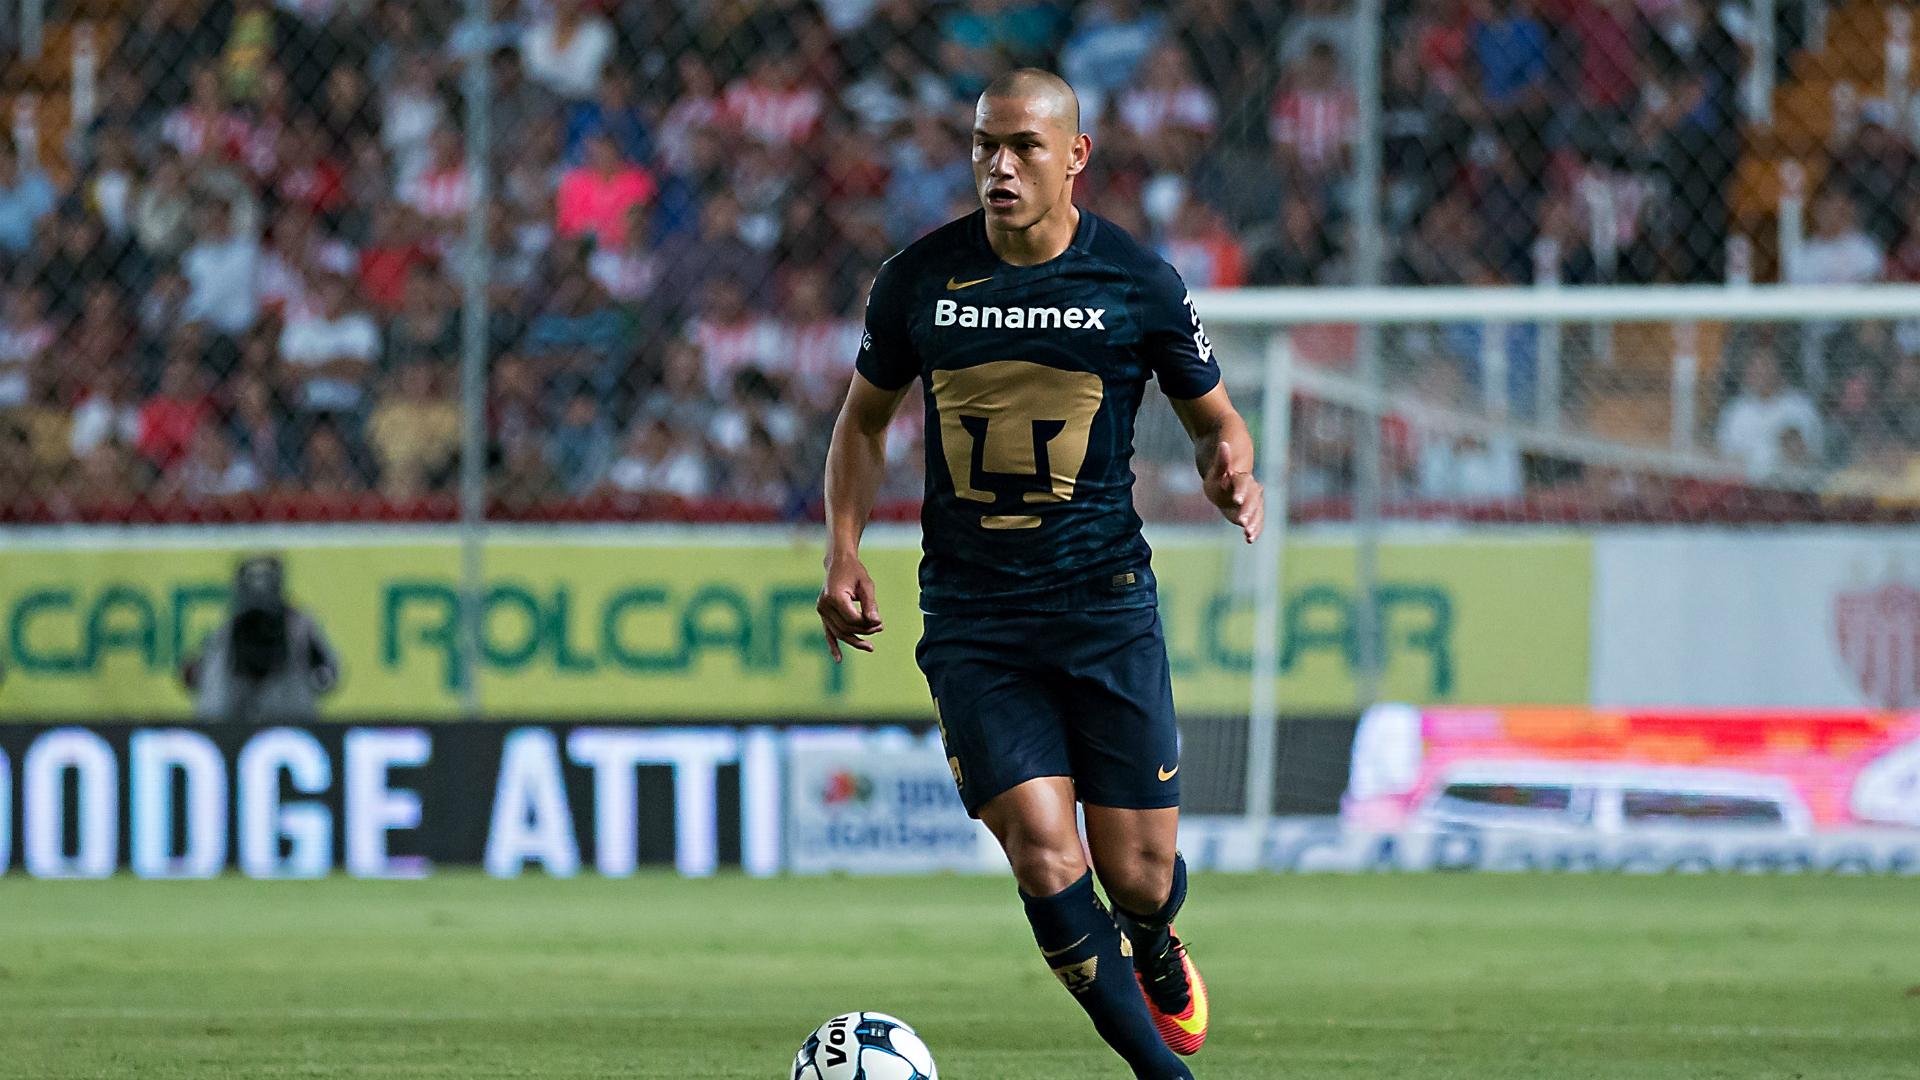 Pumas, Xolos, Liga MX, Darío Verón, futbol mexicano, Francisco Palencia, Sergio Egea